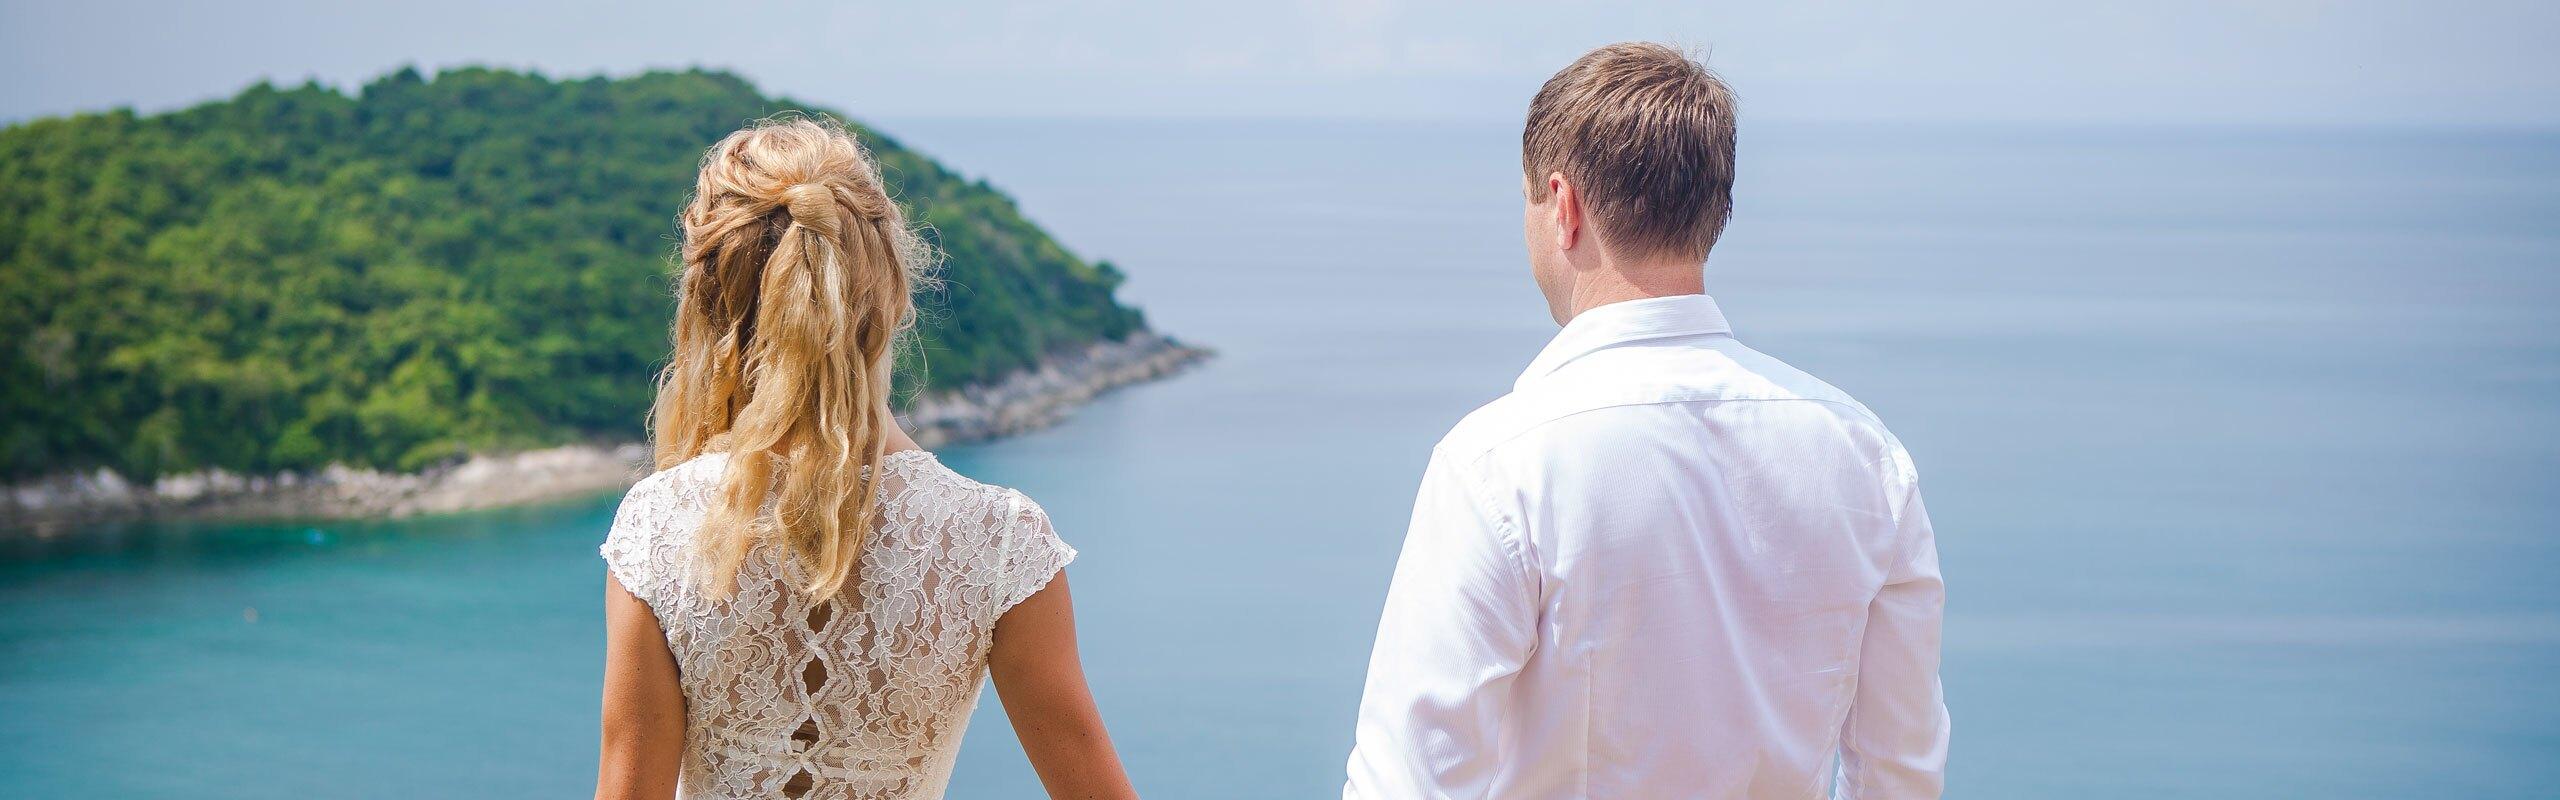 10-Day Thailand Honeymoon Tour